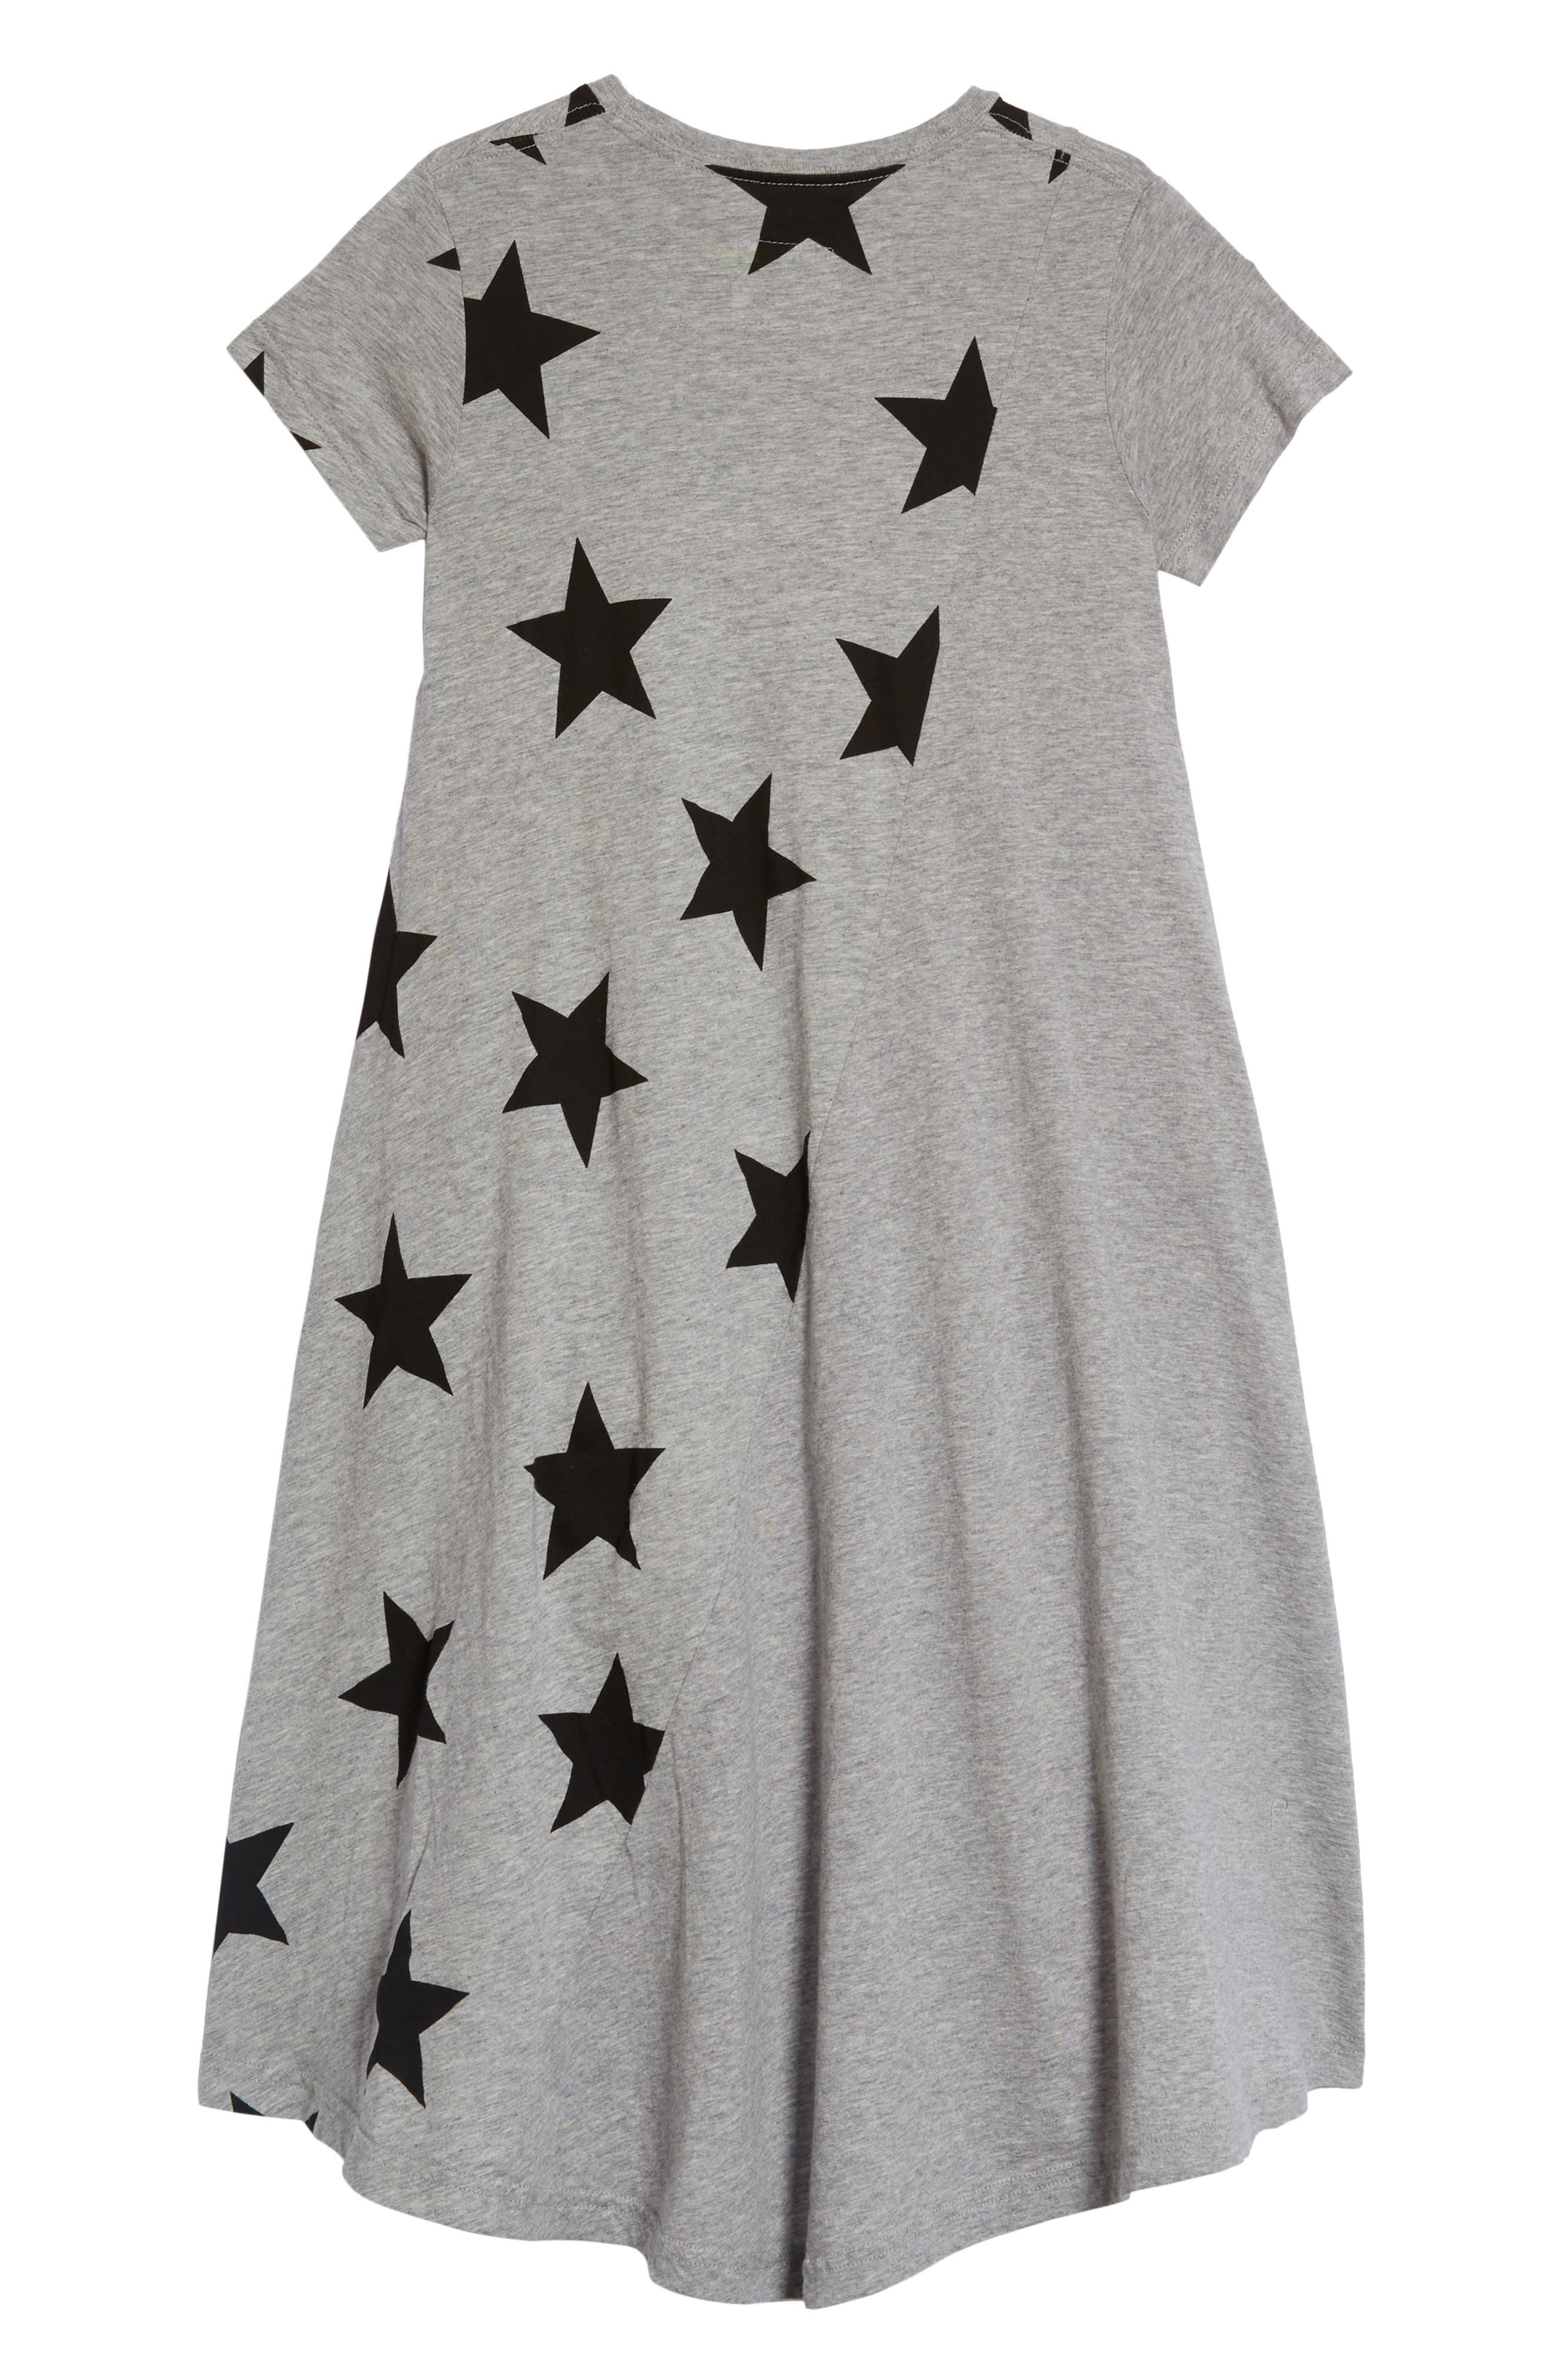 360 Star Print Dress,                             Alternate thumbnail 2, color,                             Heather Grey